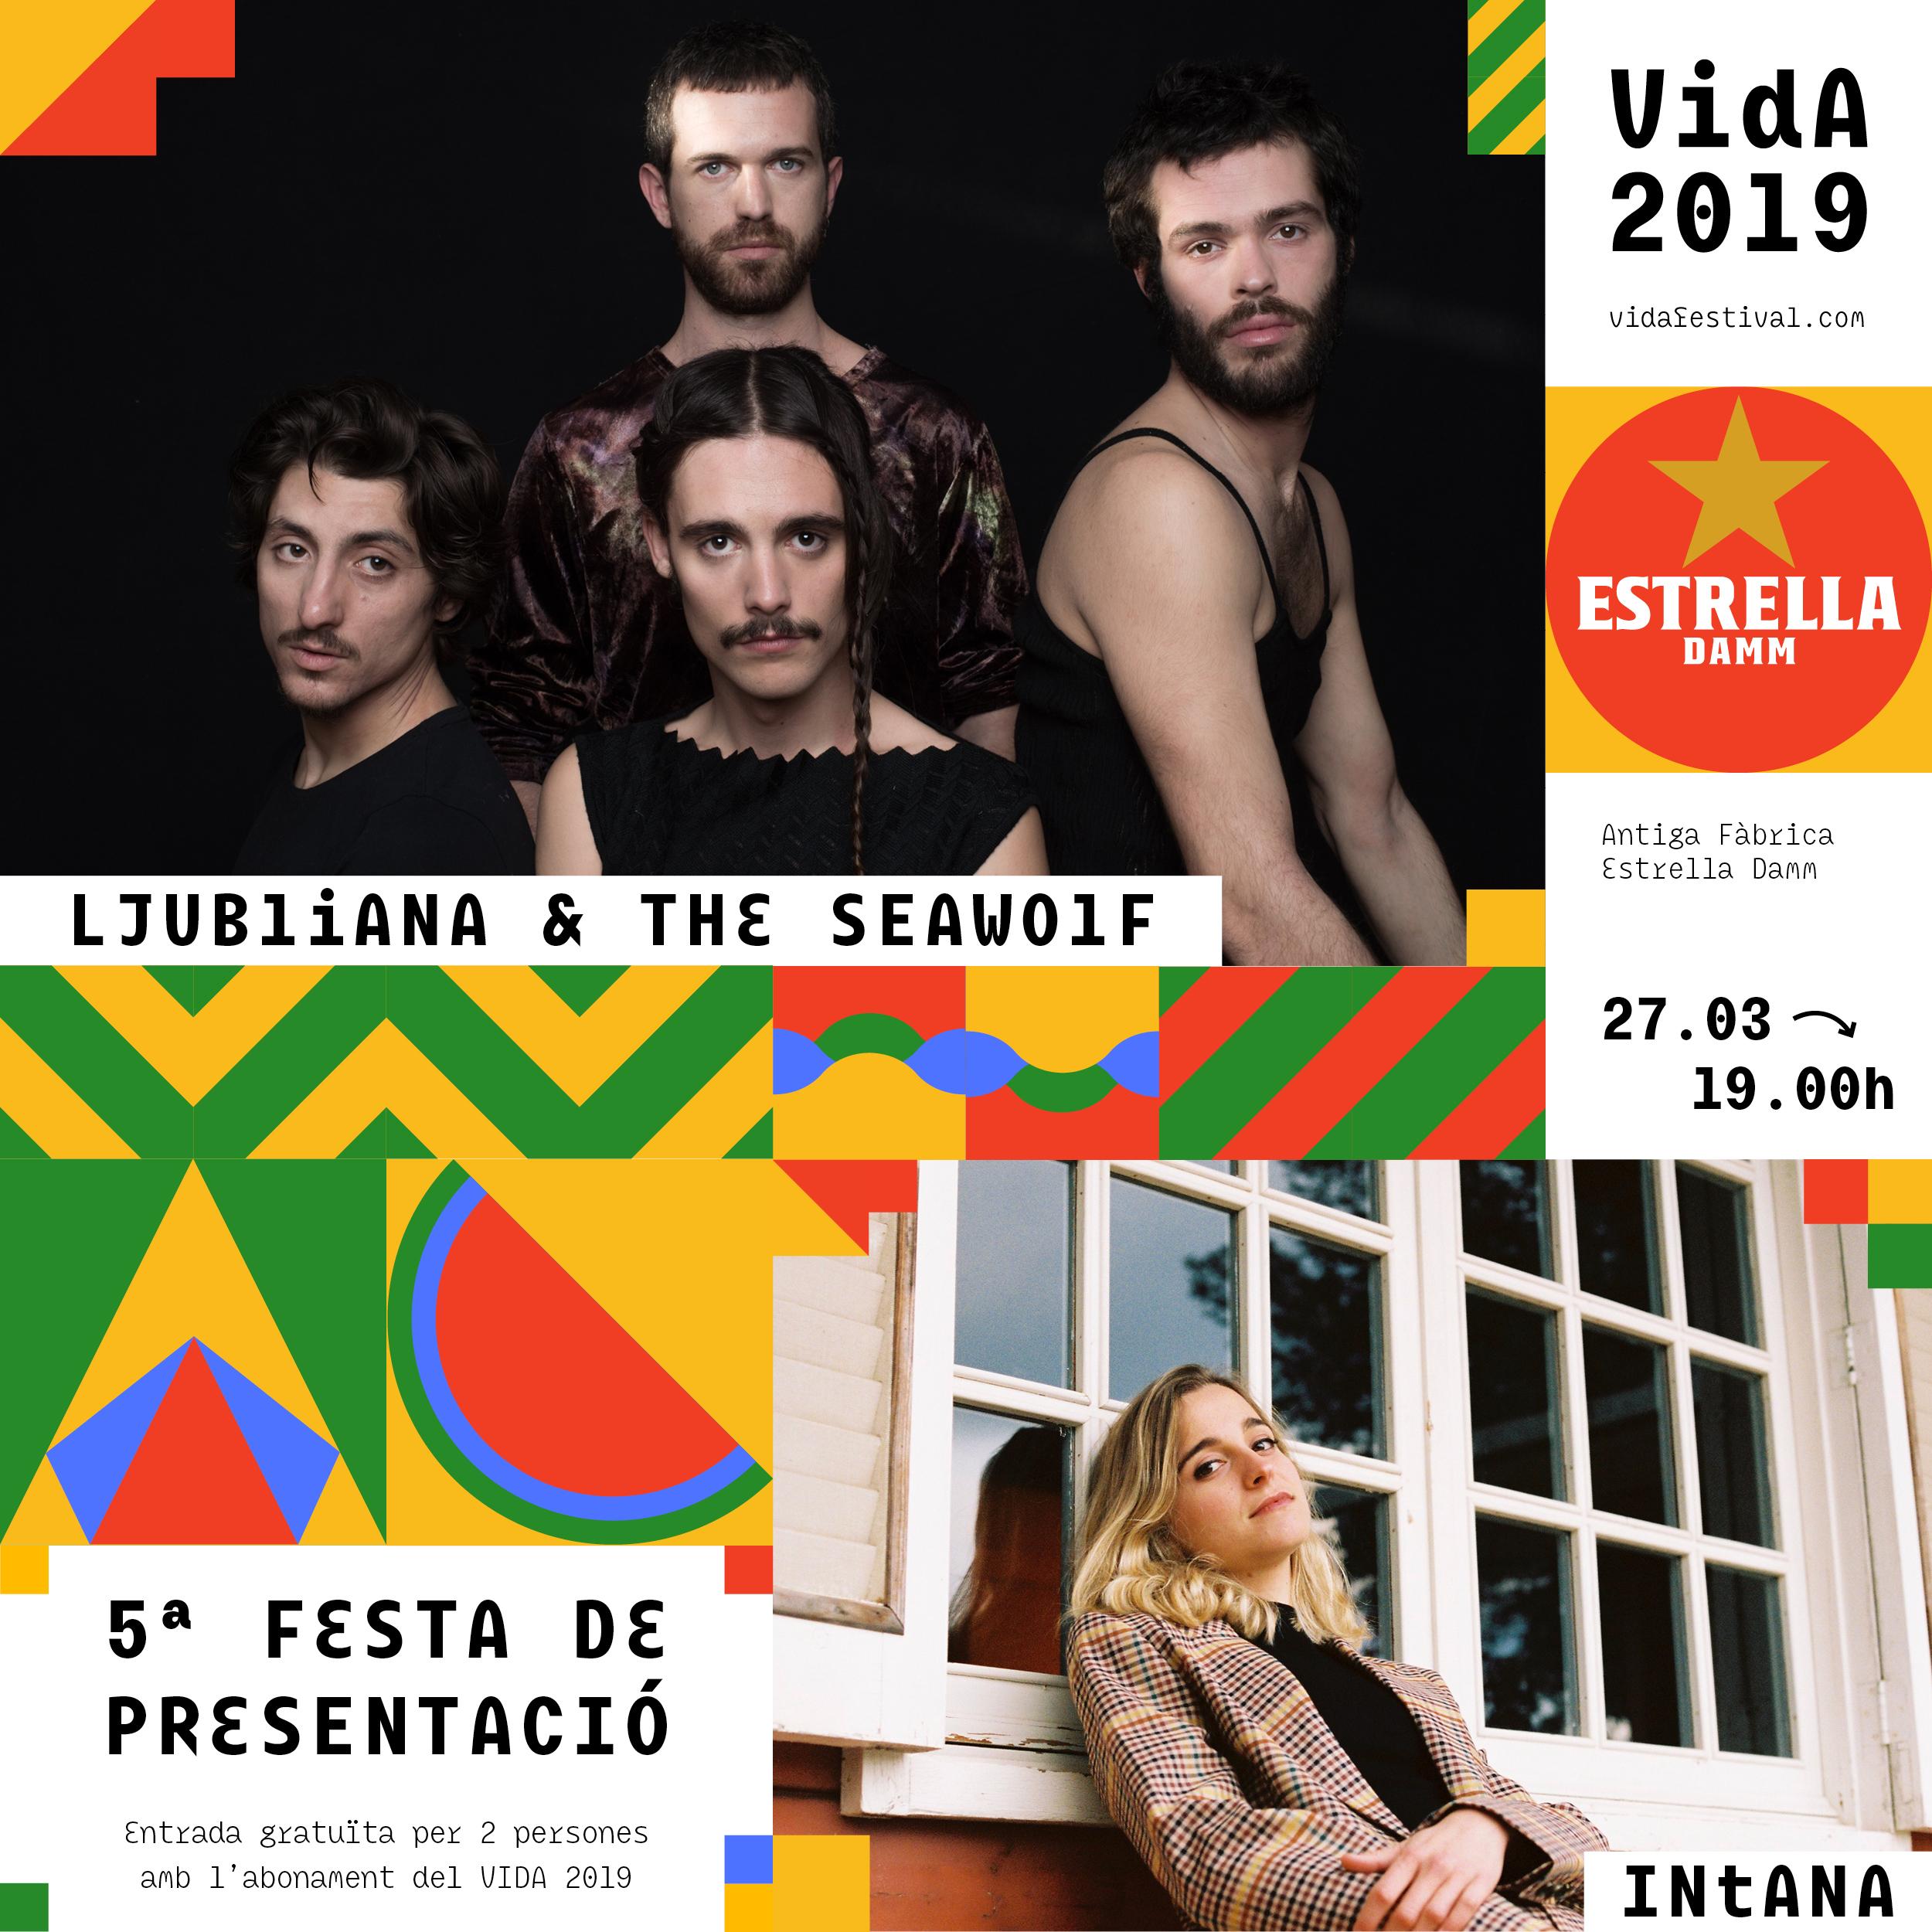 Ljubliana & The Seawolf + Intana 1x1 V2.jpg